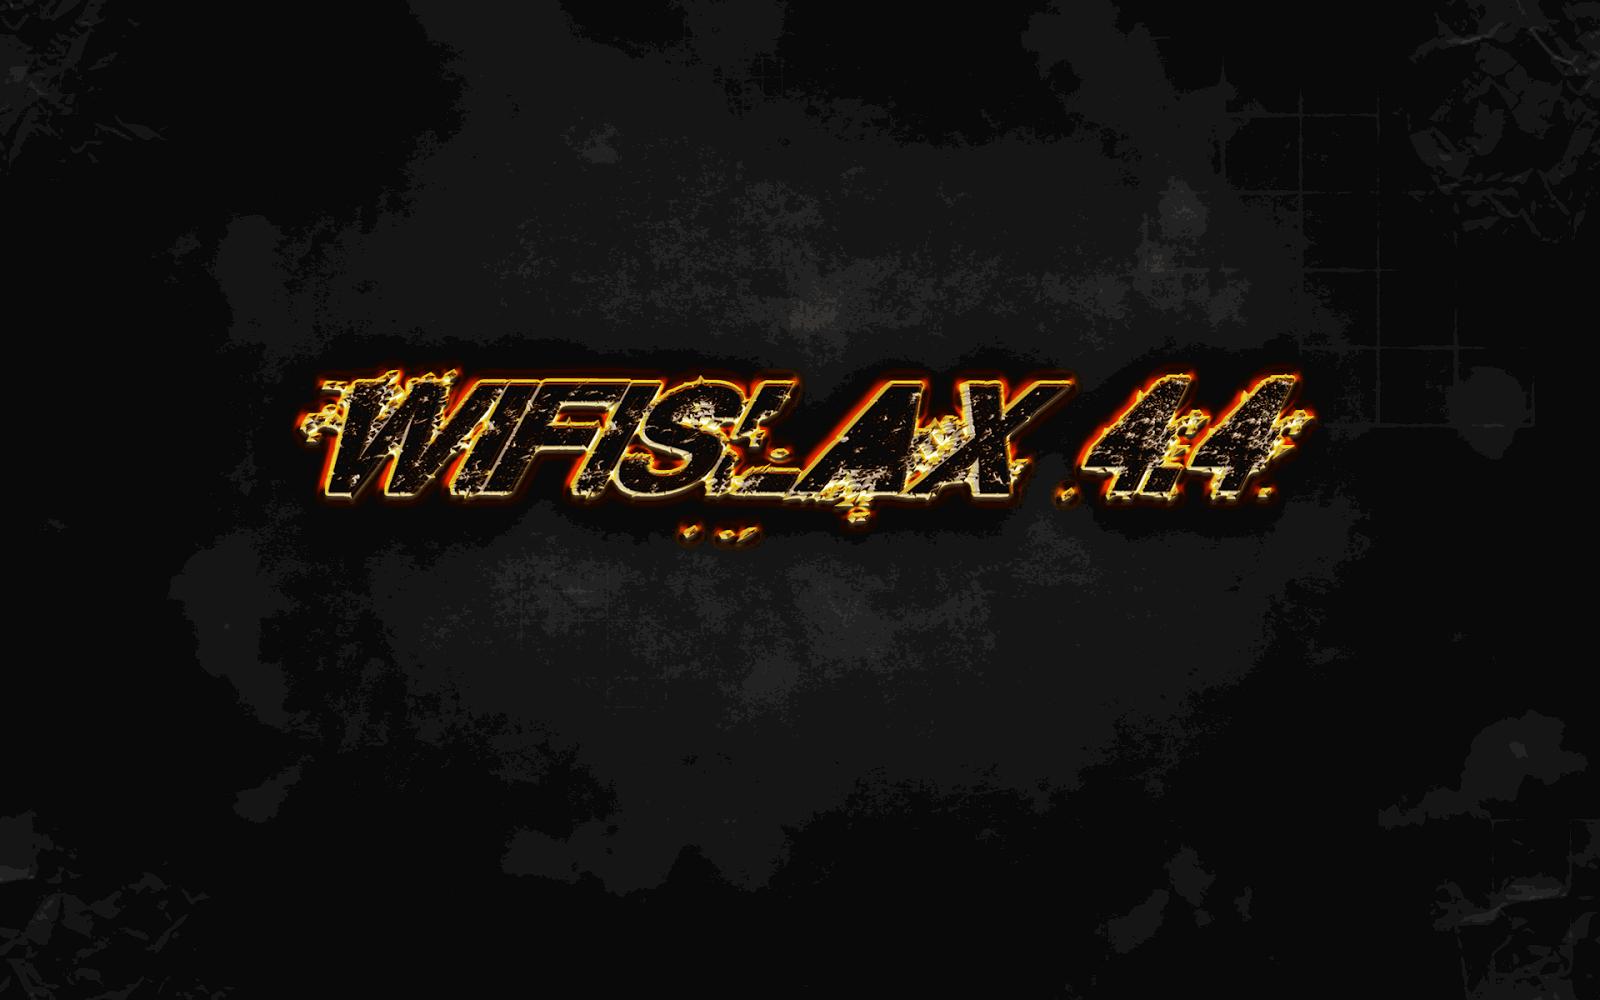 wifislax 4.4 gratuit